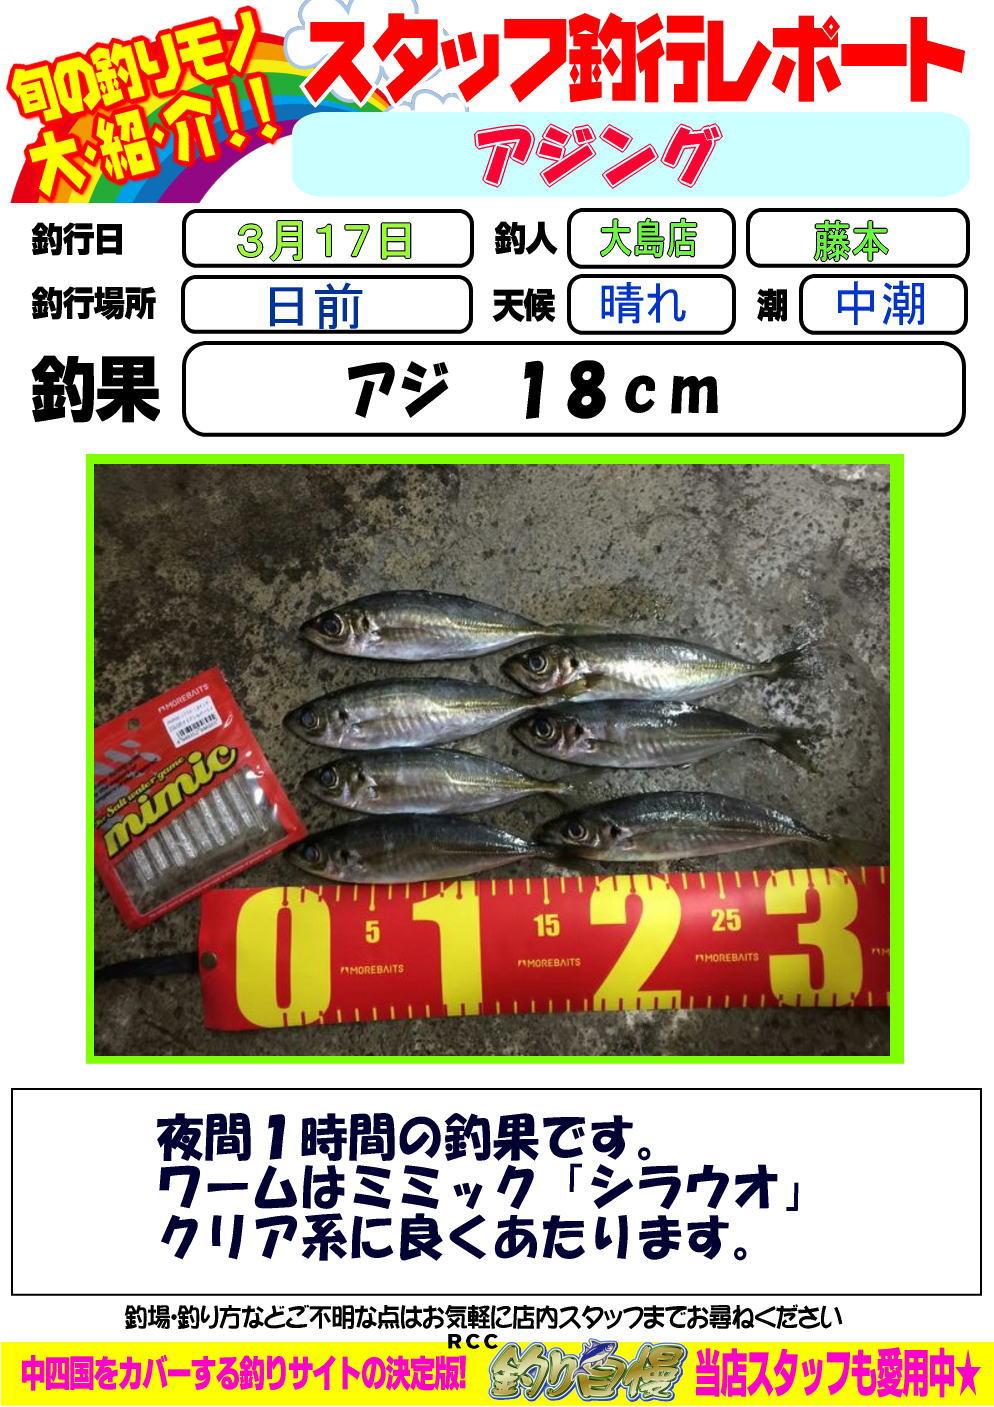 http://www.e-angle.co.jp/shop/blog/blog-20150317-ooshima-01.jpg